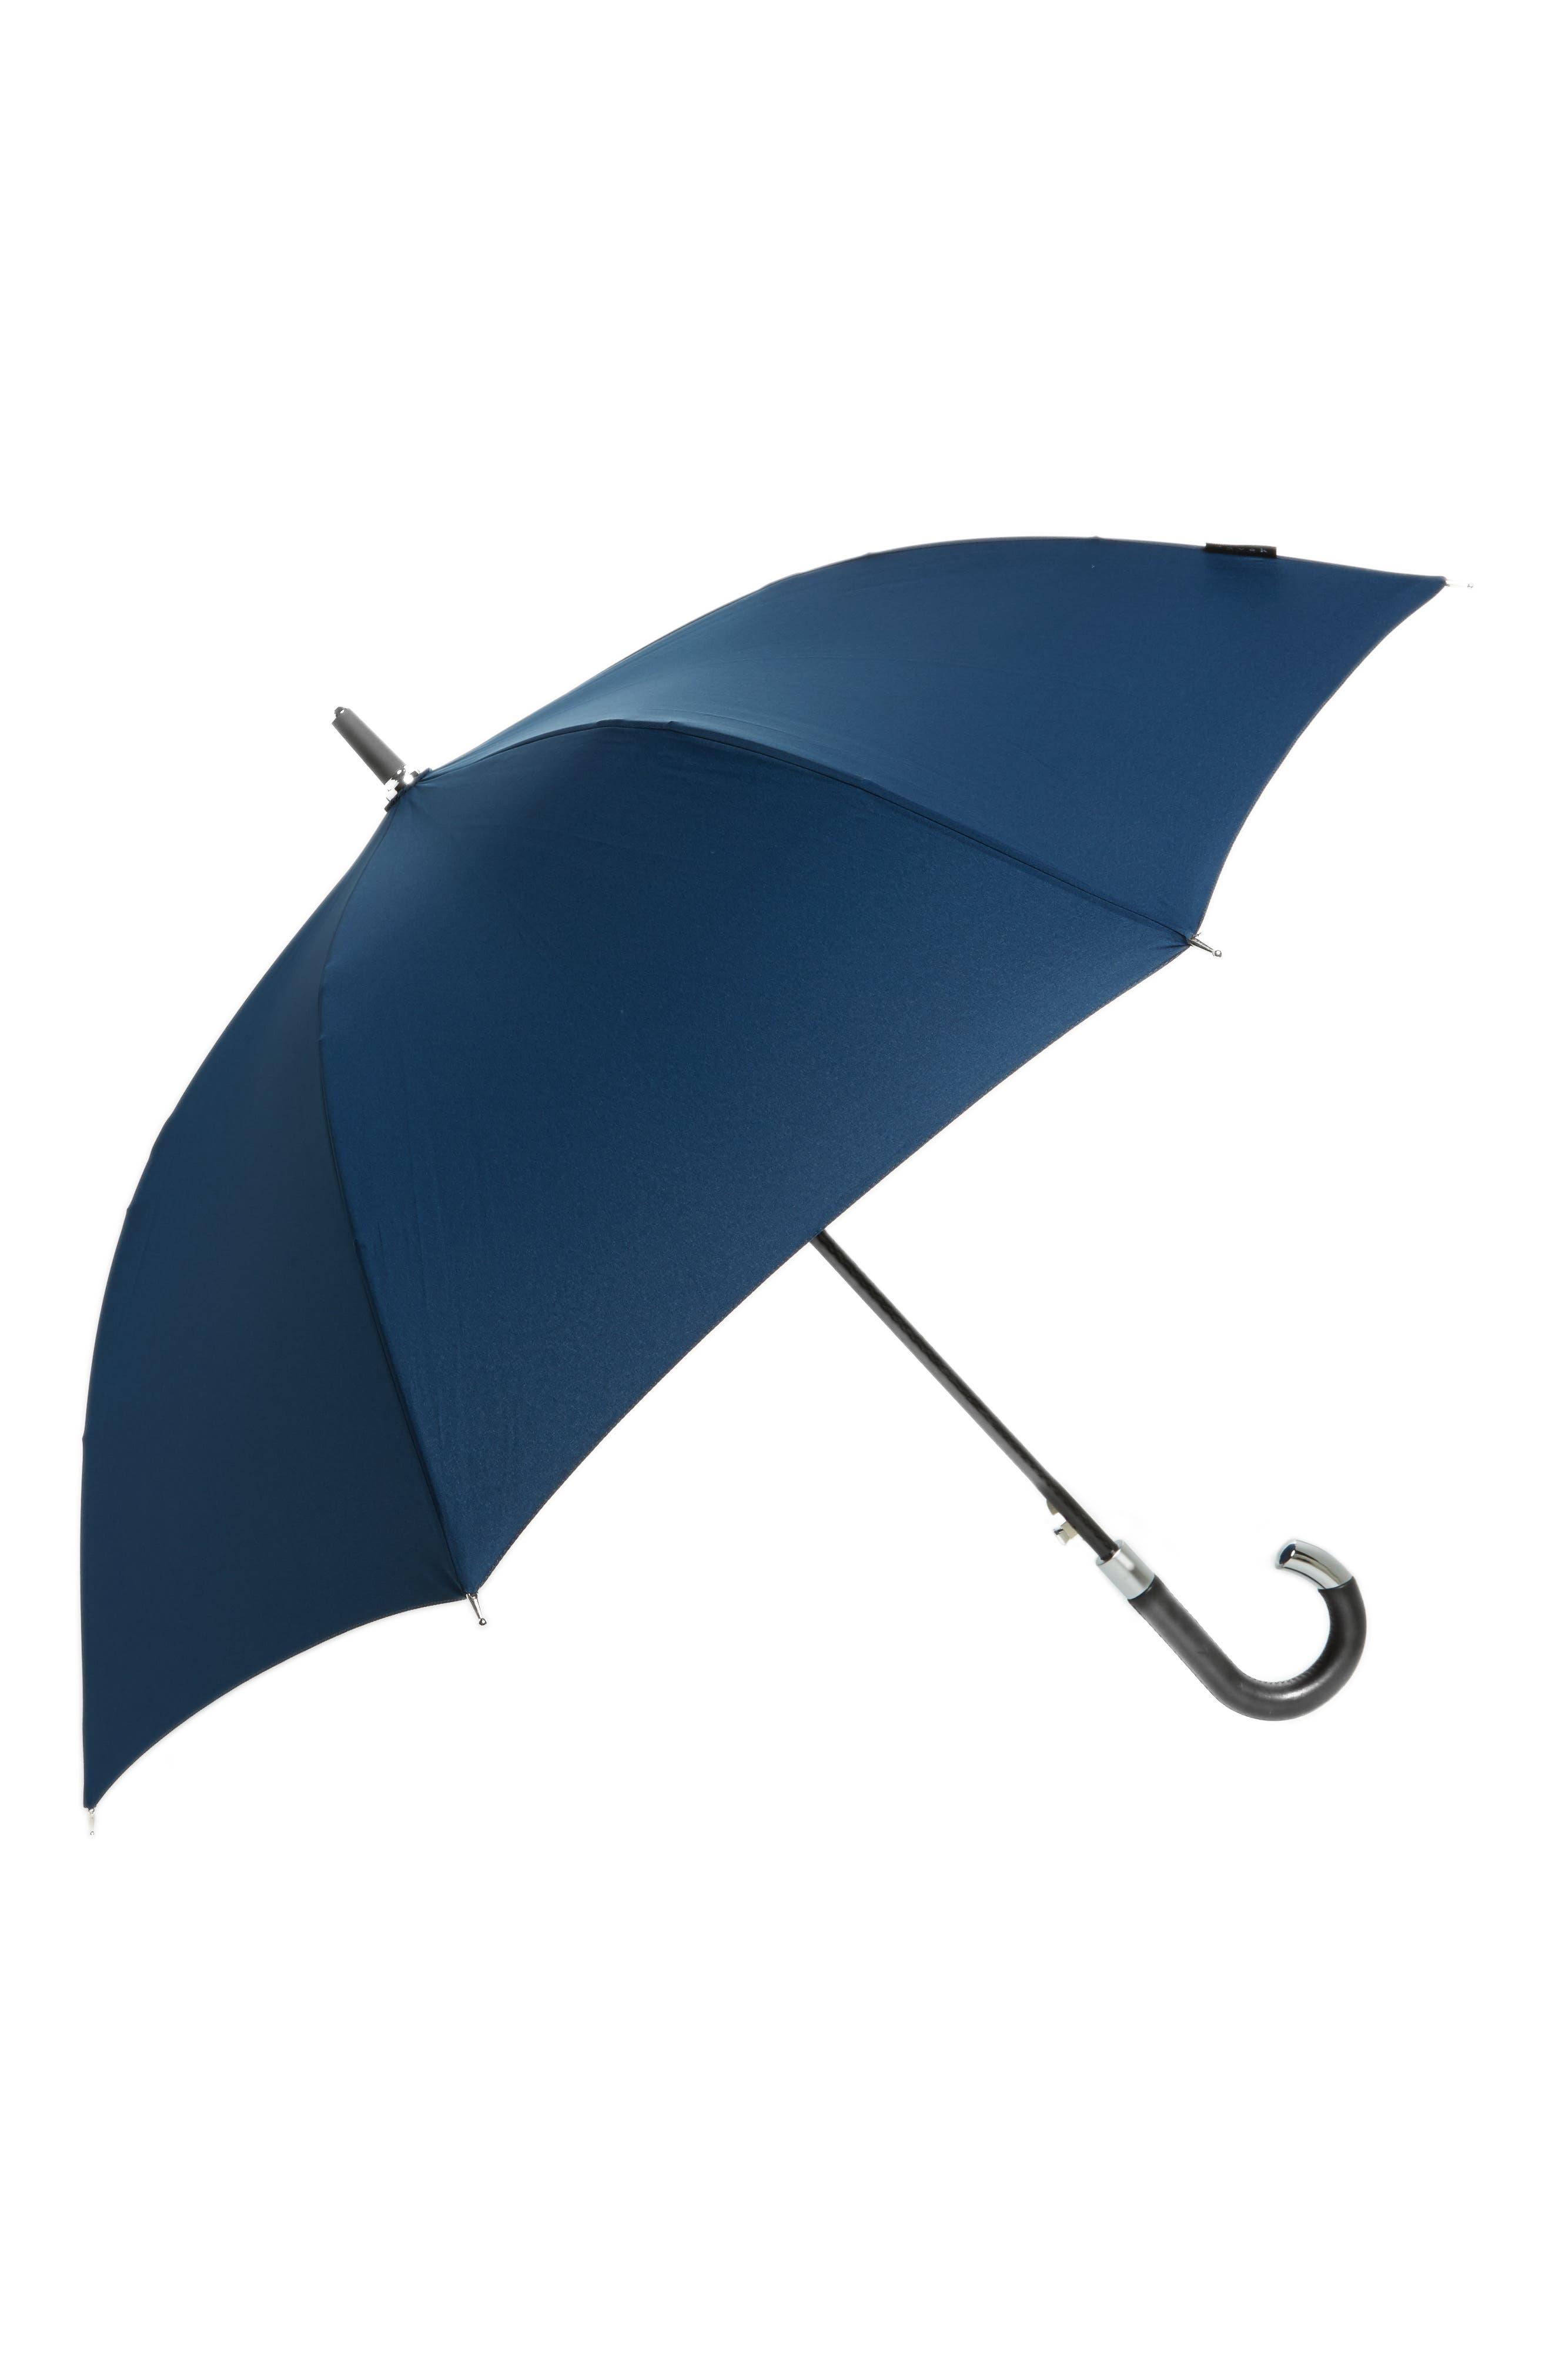 Alternate Image 1 Selected - DAVEK Elite Cane Umbrella